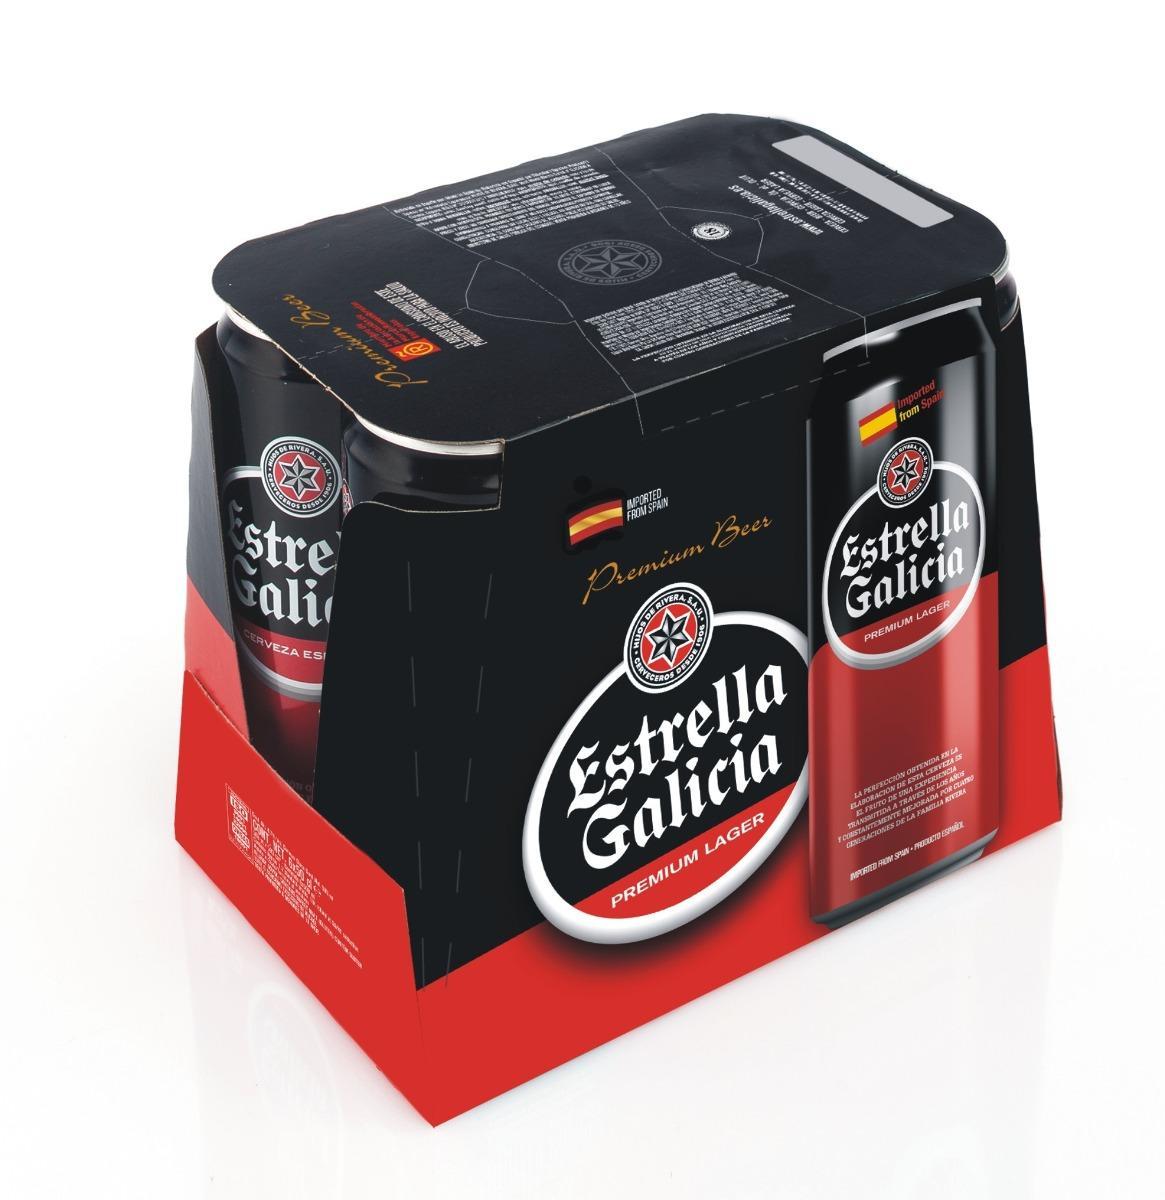 Cerveza Especial  Estrella Galicia. PACK 6 Latas 33cl